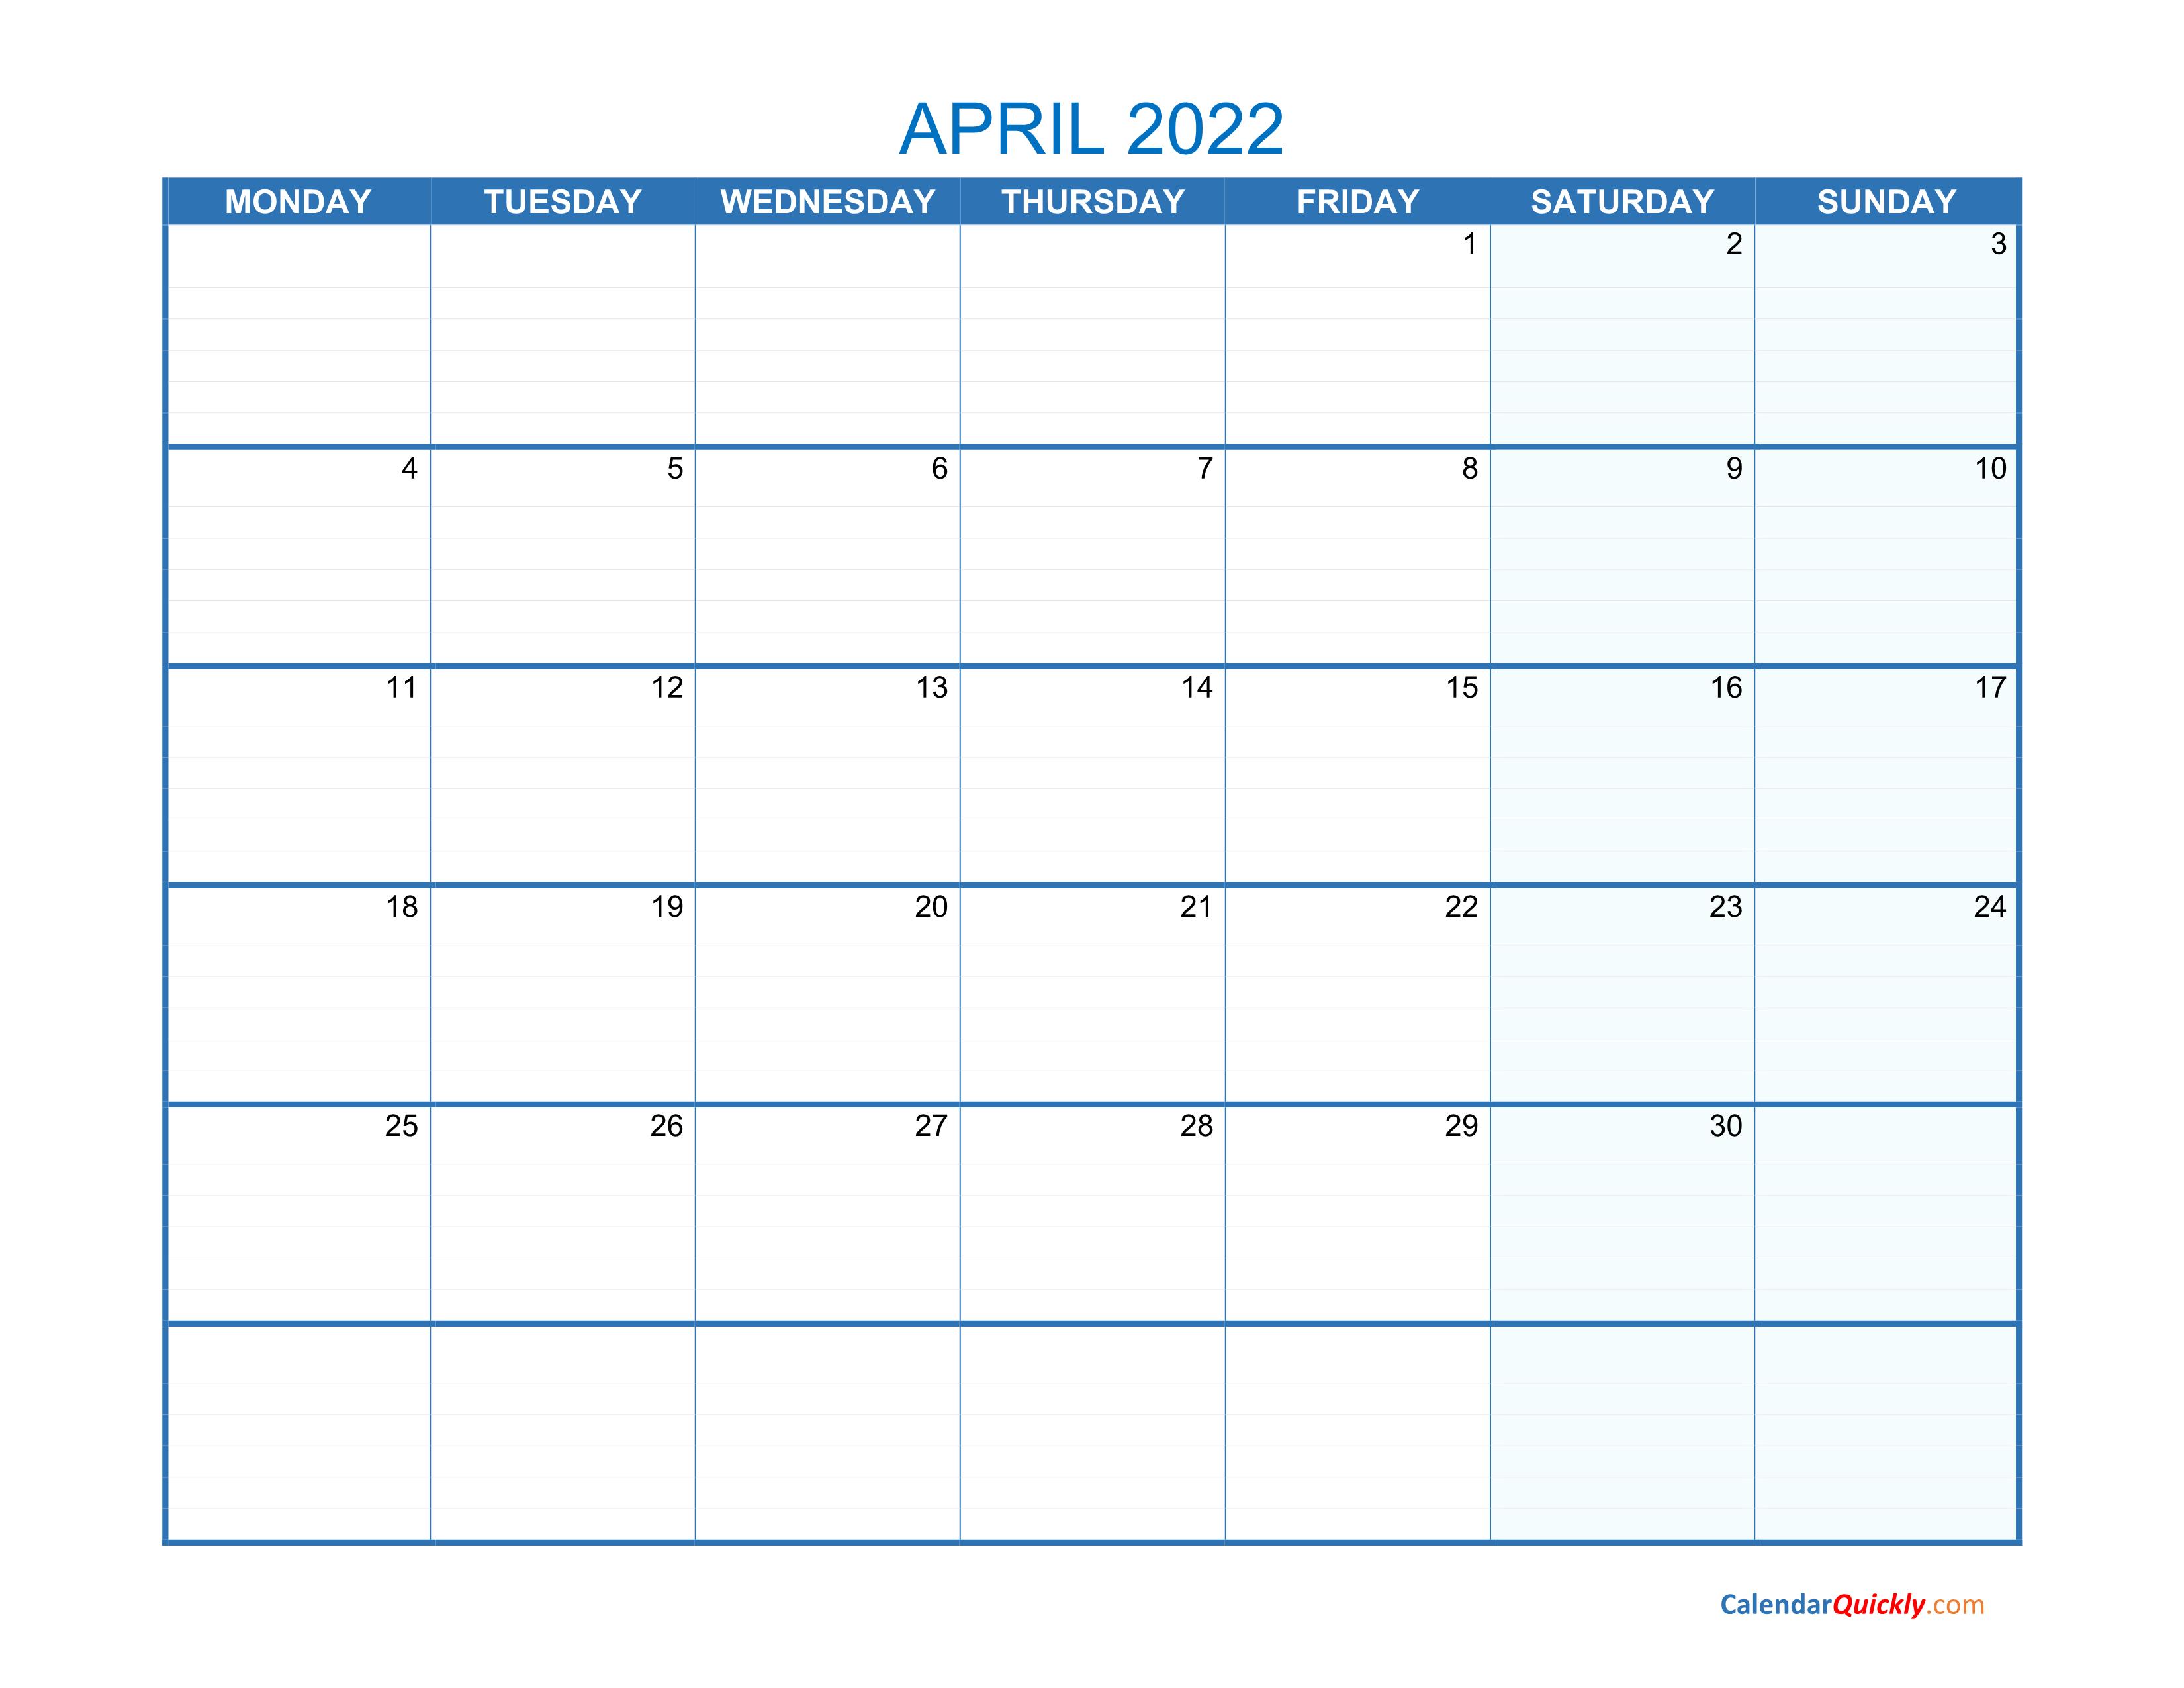 April Monday 2022 Blank Calendar | Calendar Quickly throughout February March And April 2022 Calendar